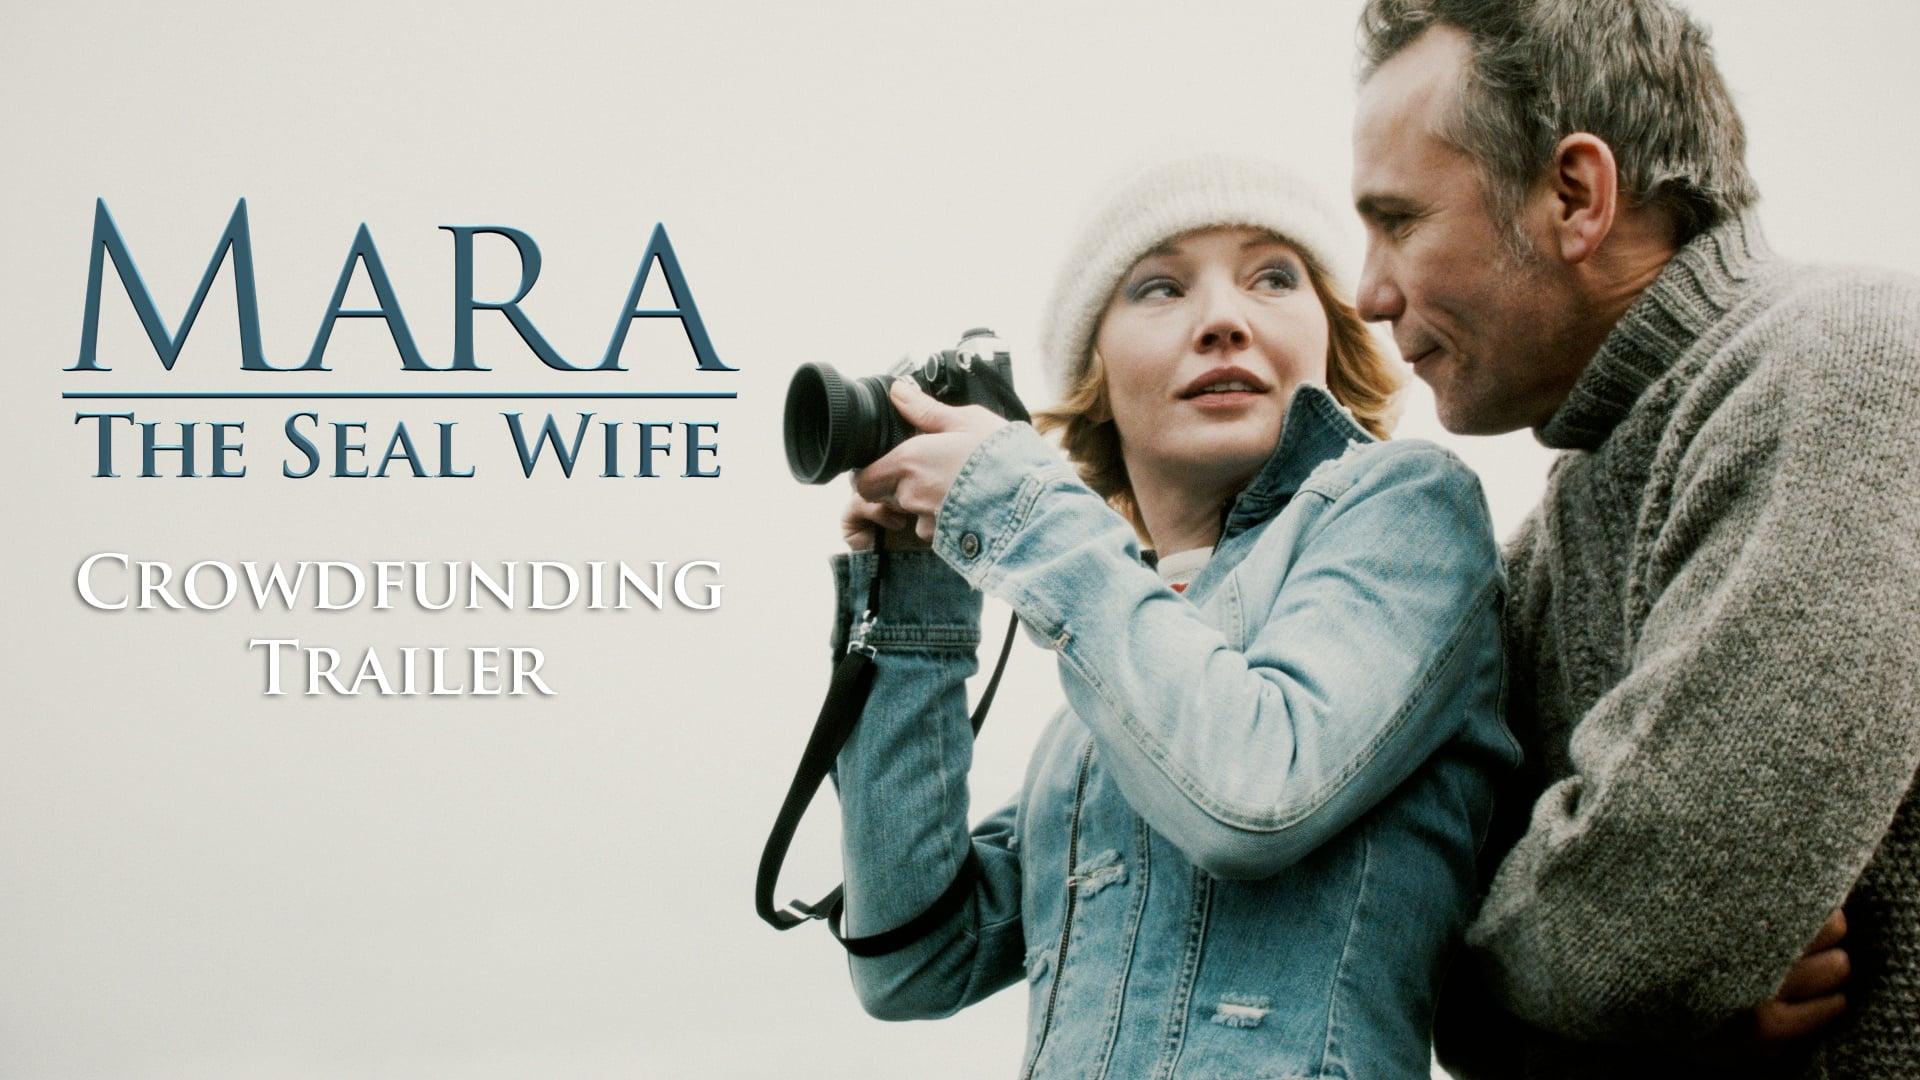 Mara: The Seal Wife - Crowdfunding Teaser Trailer